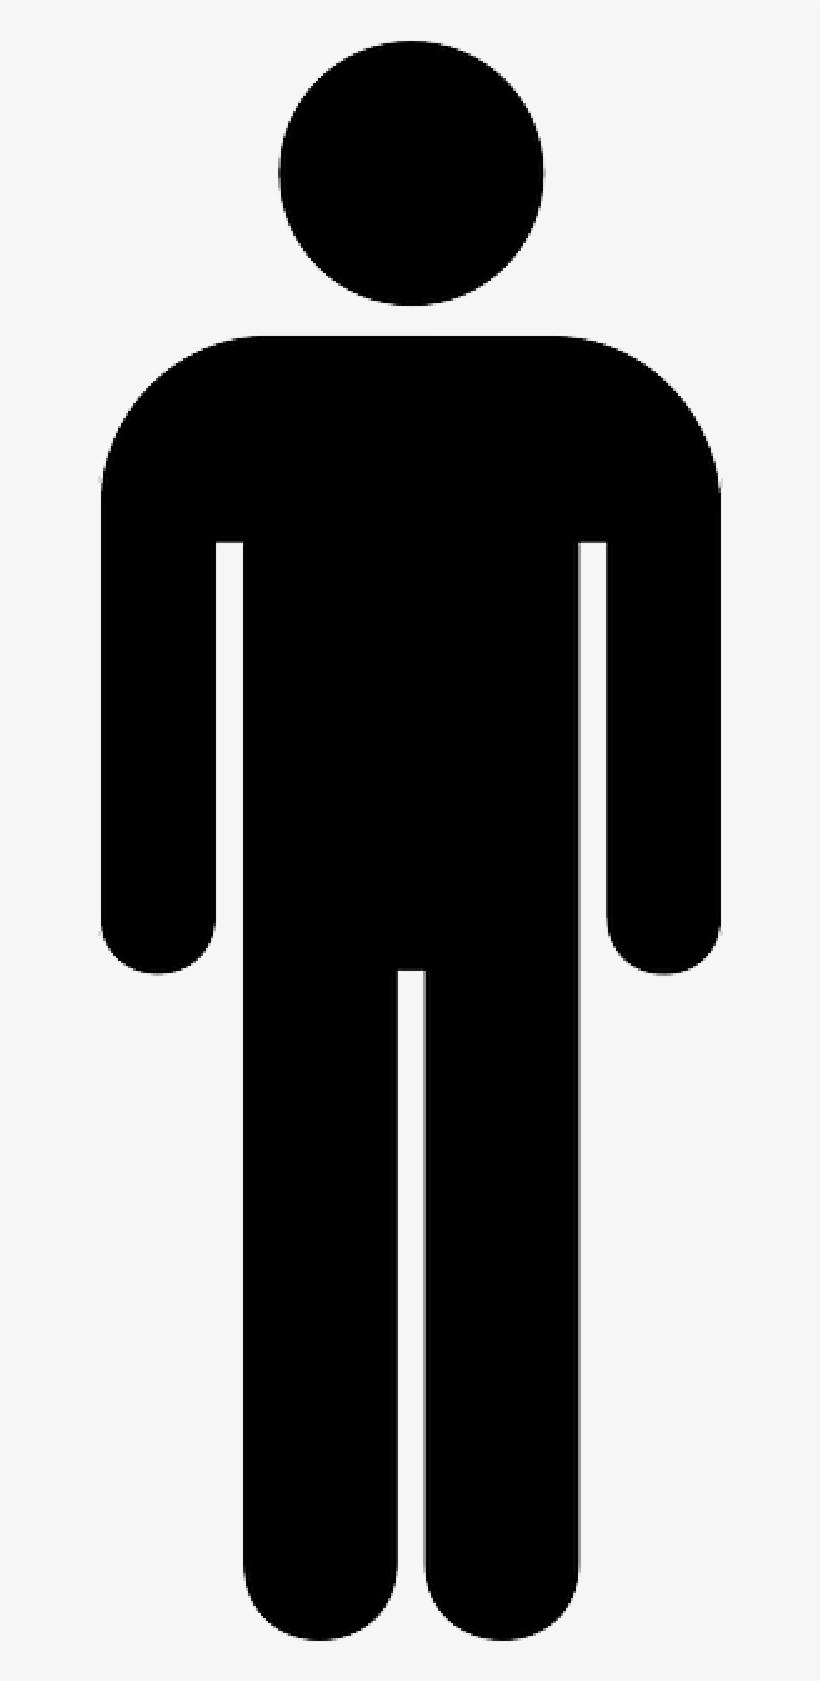 bathroom vector male sign clip transparent download - man sign transparent  png - 800x1600 - free download on nicepng  nicepng